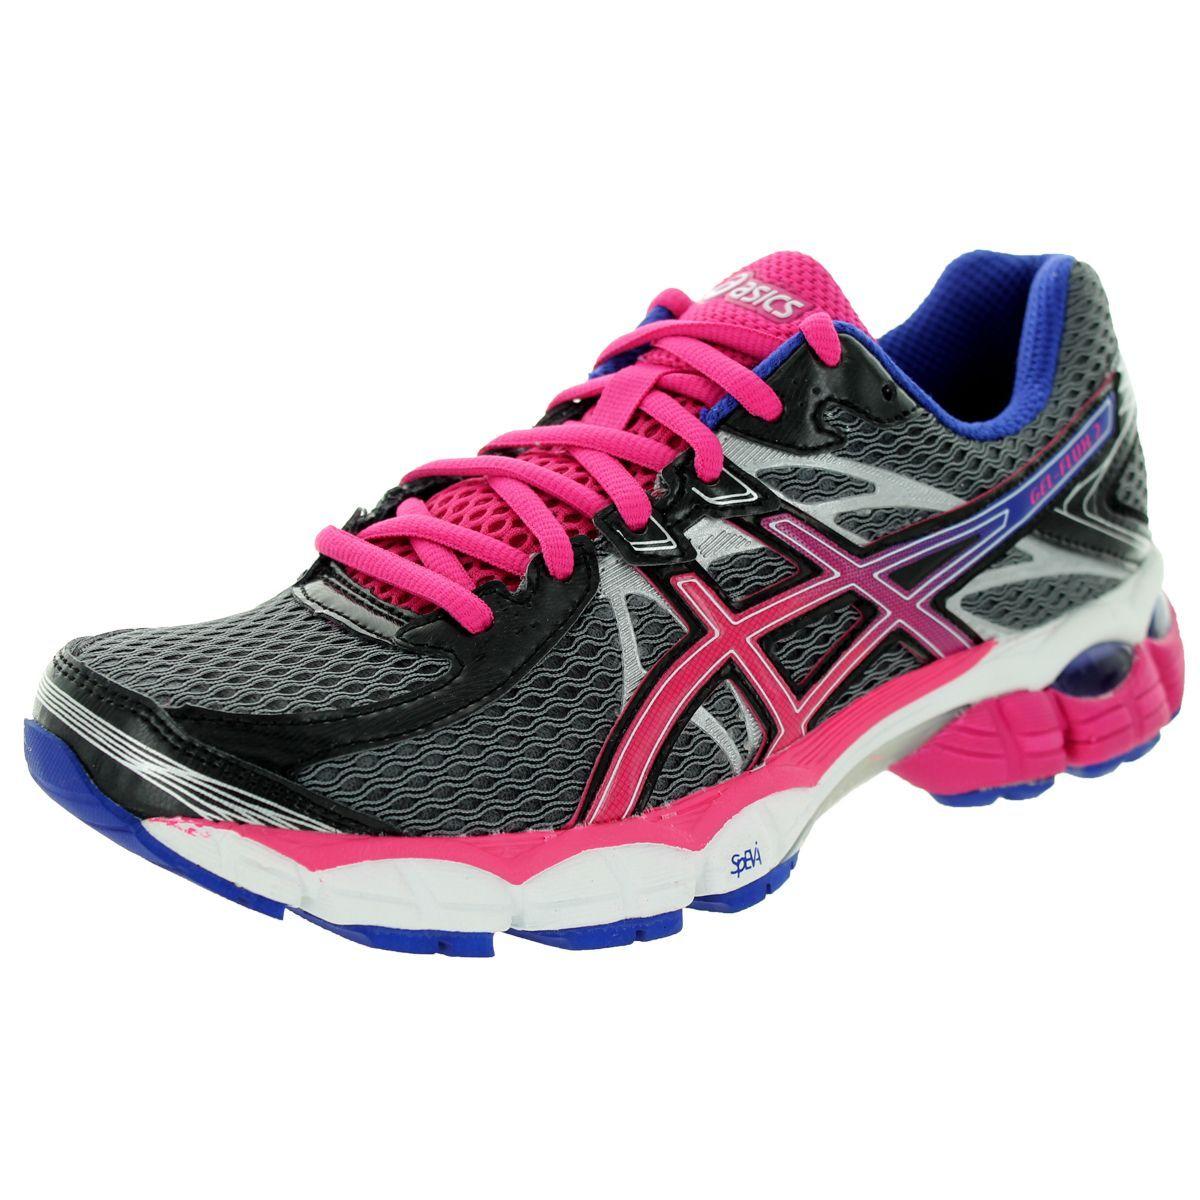 b0f01d5cb9ea Asics Women s Gel-Flux 2 Onyx Hot Pink Blue Running Shoe